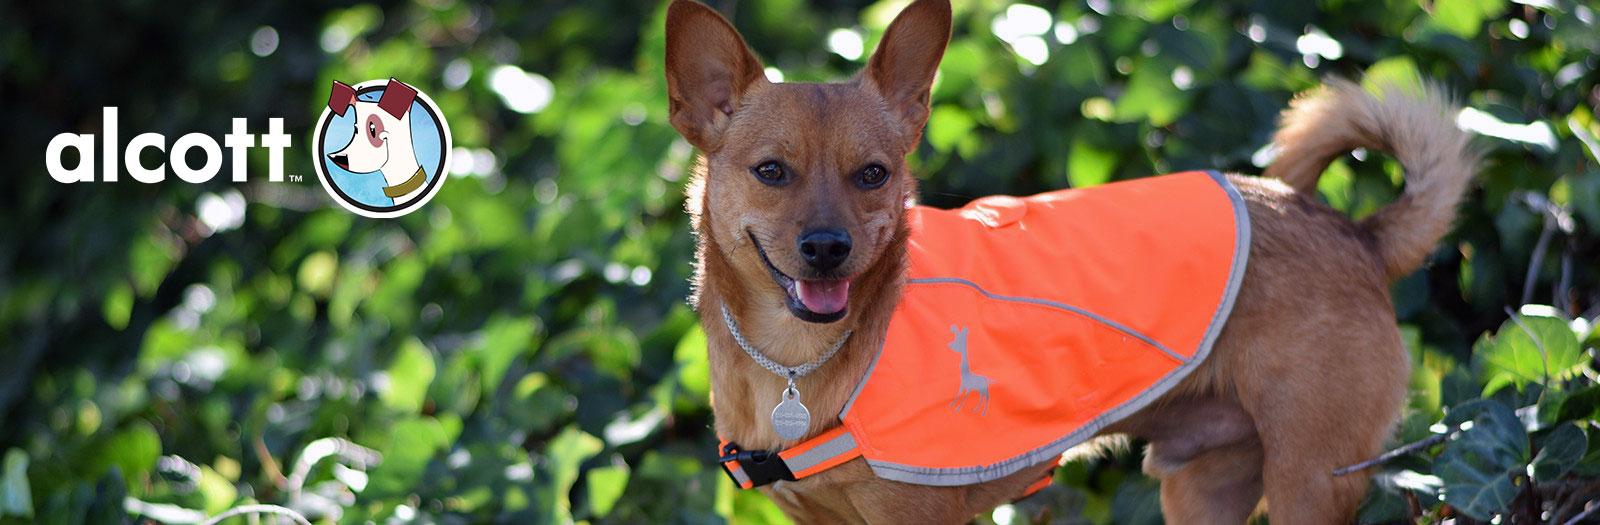 Alcott Hundezubehör Online Shop, Bild 1